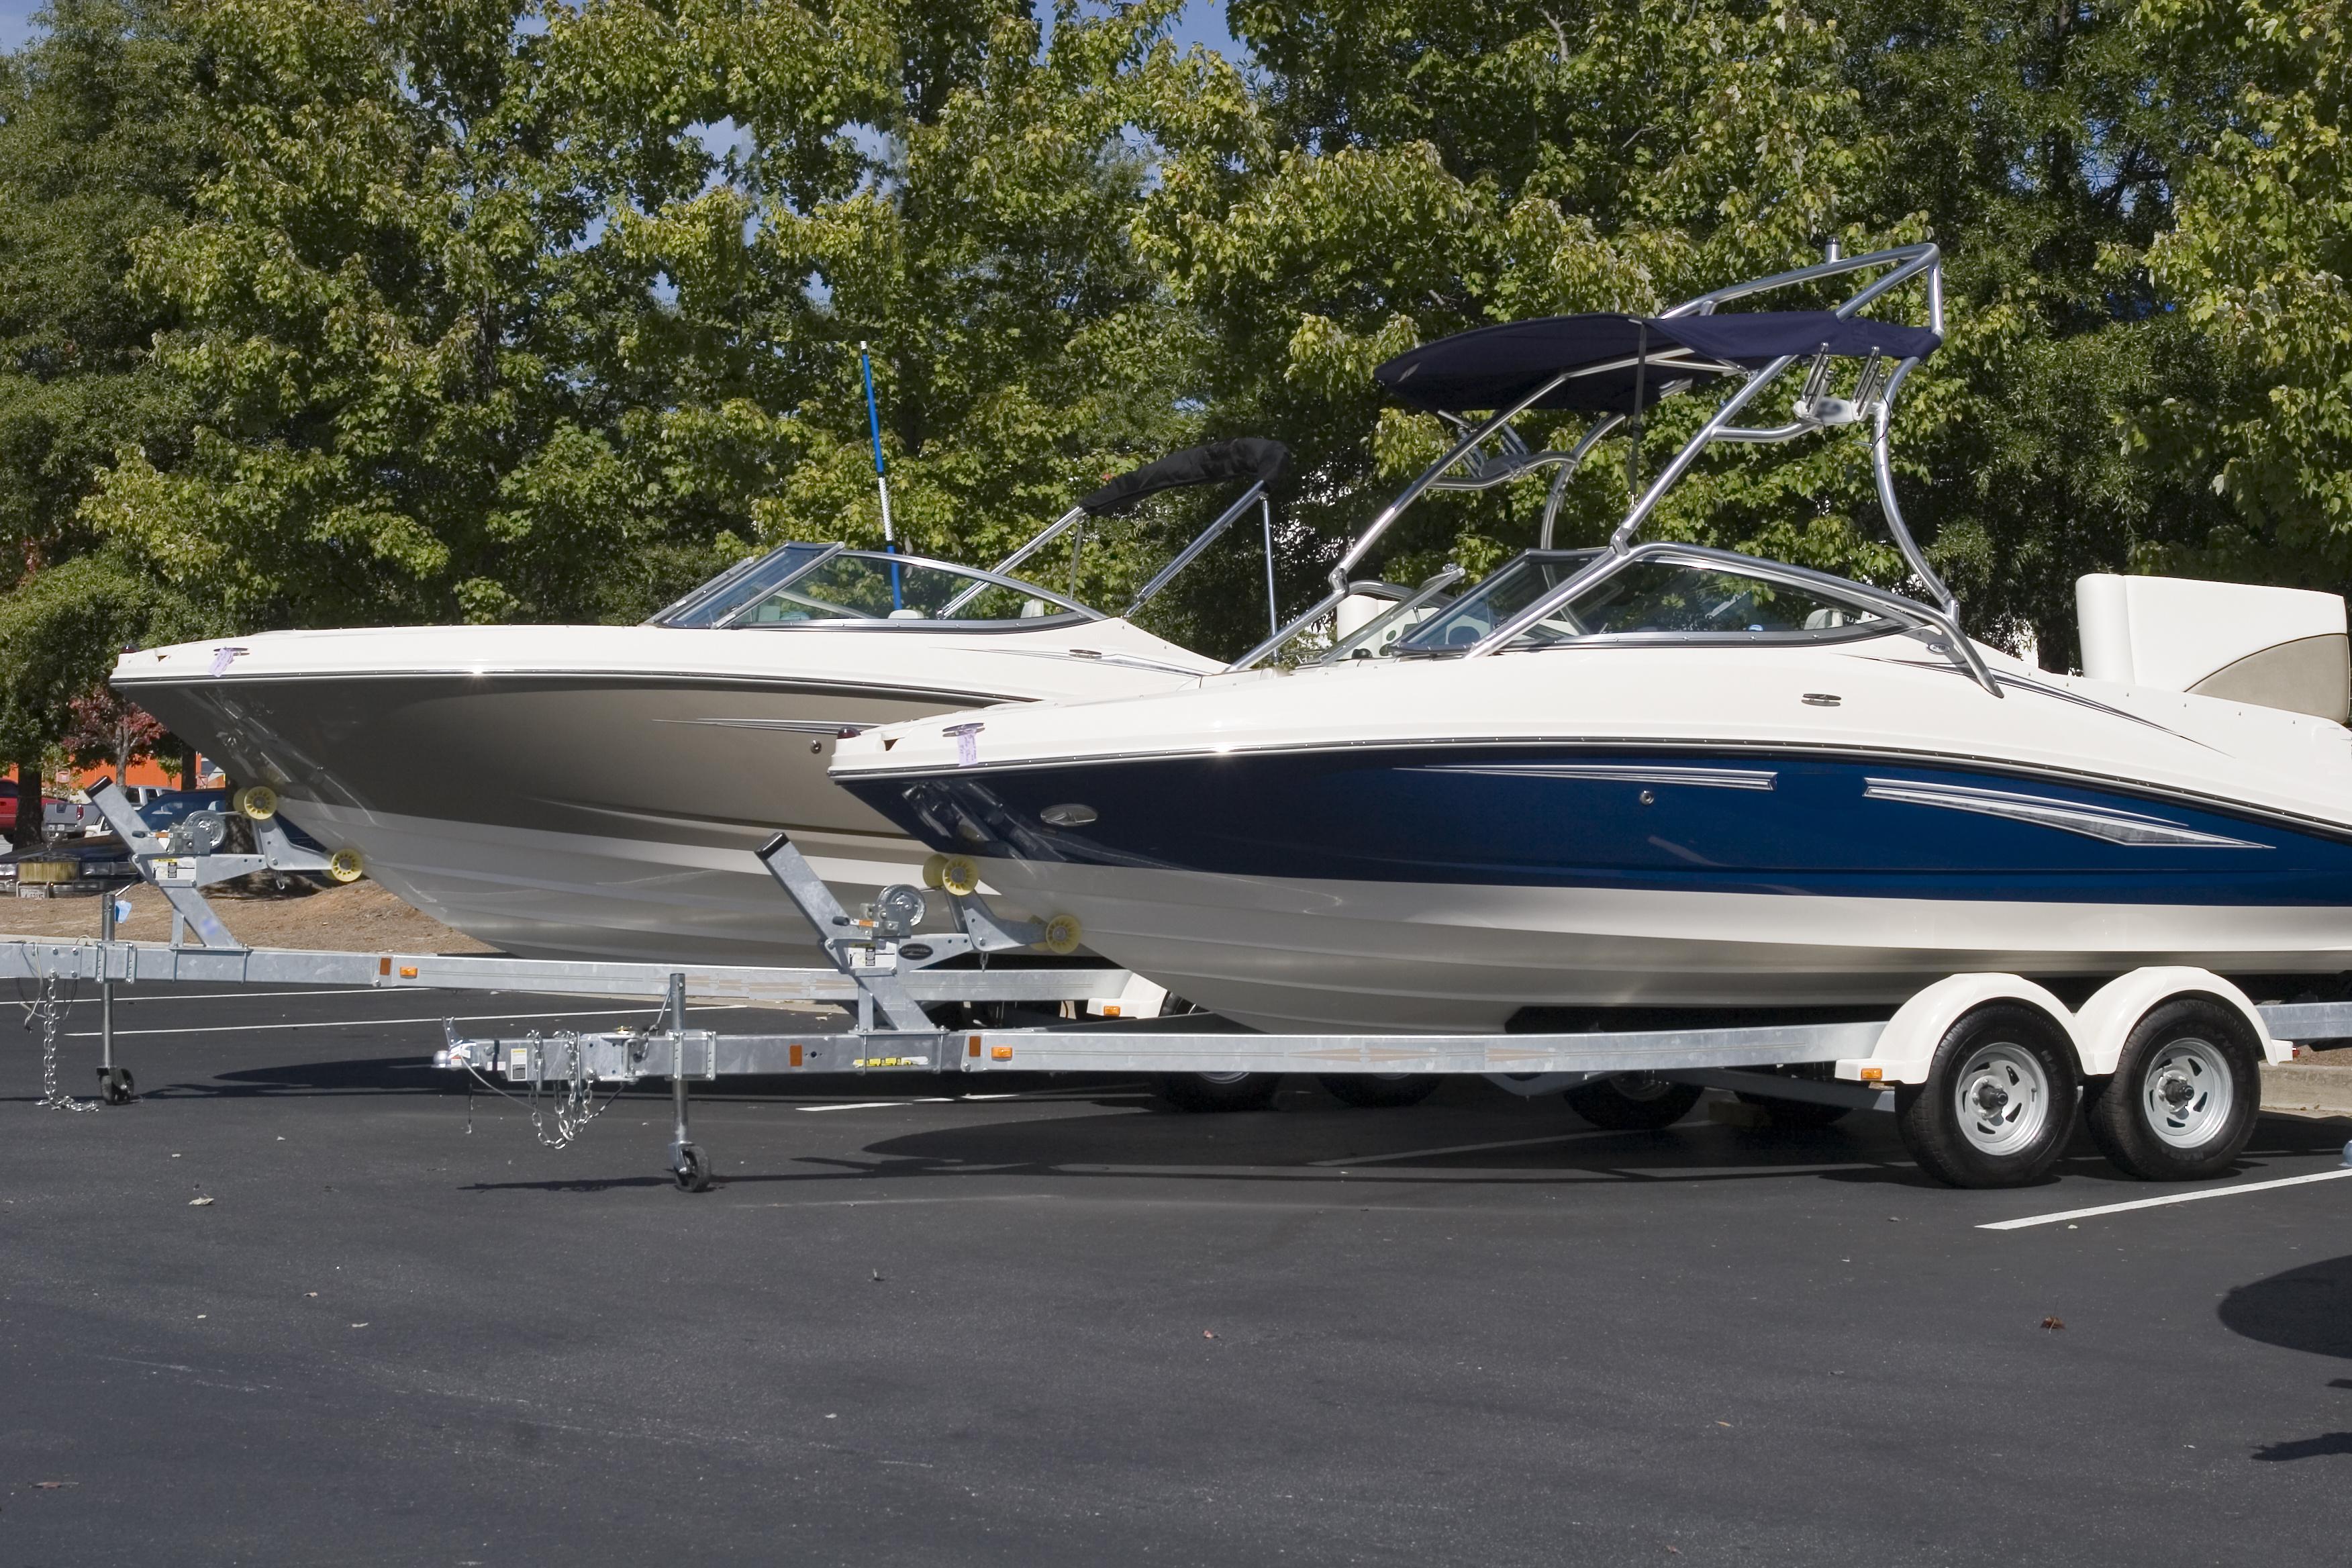 Boat Parking